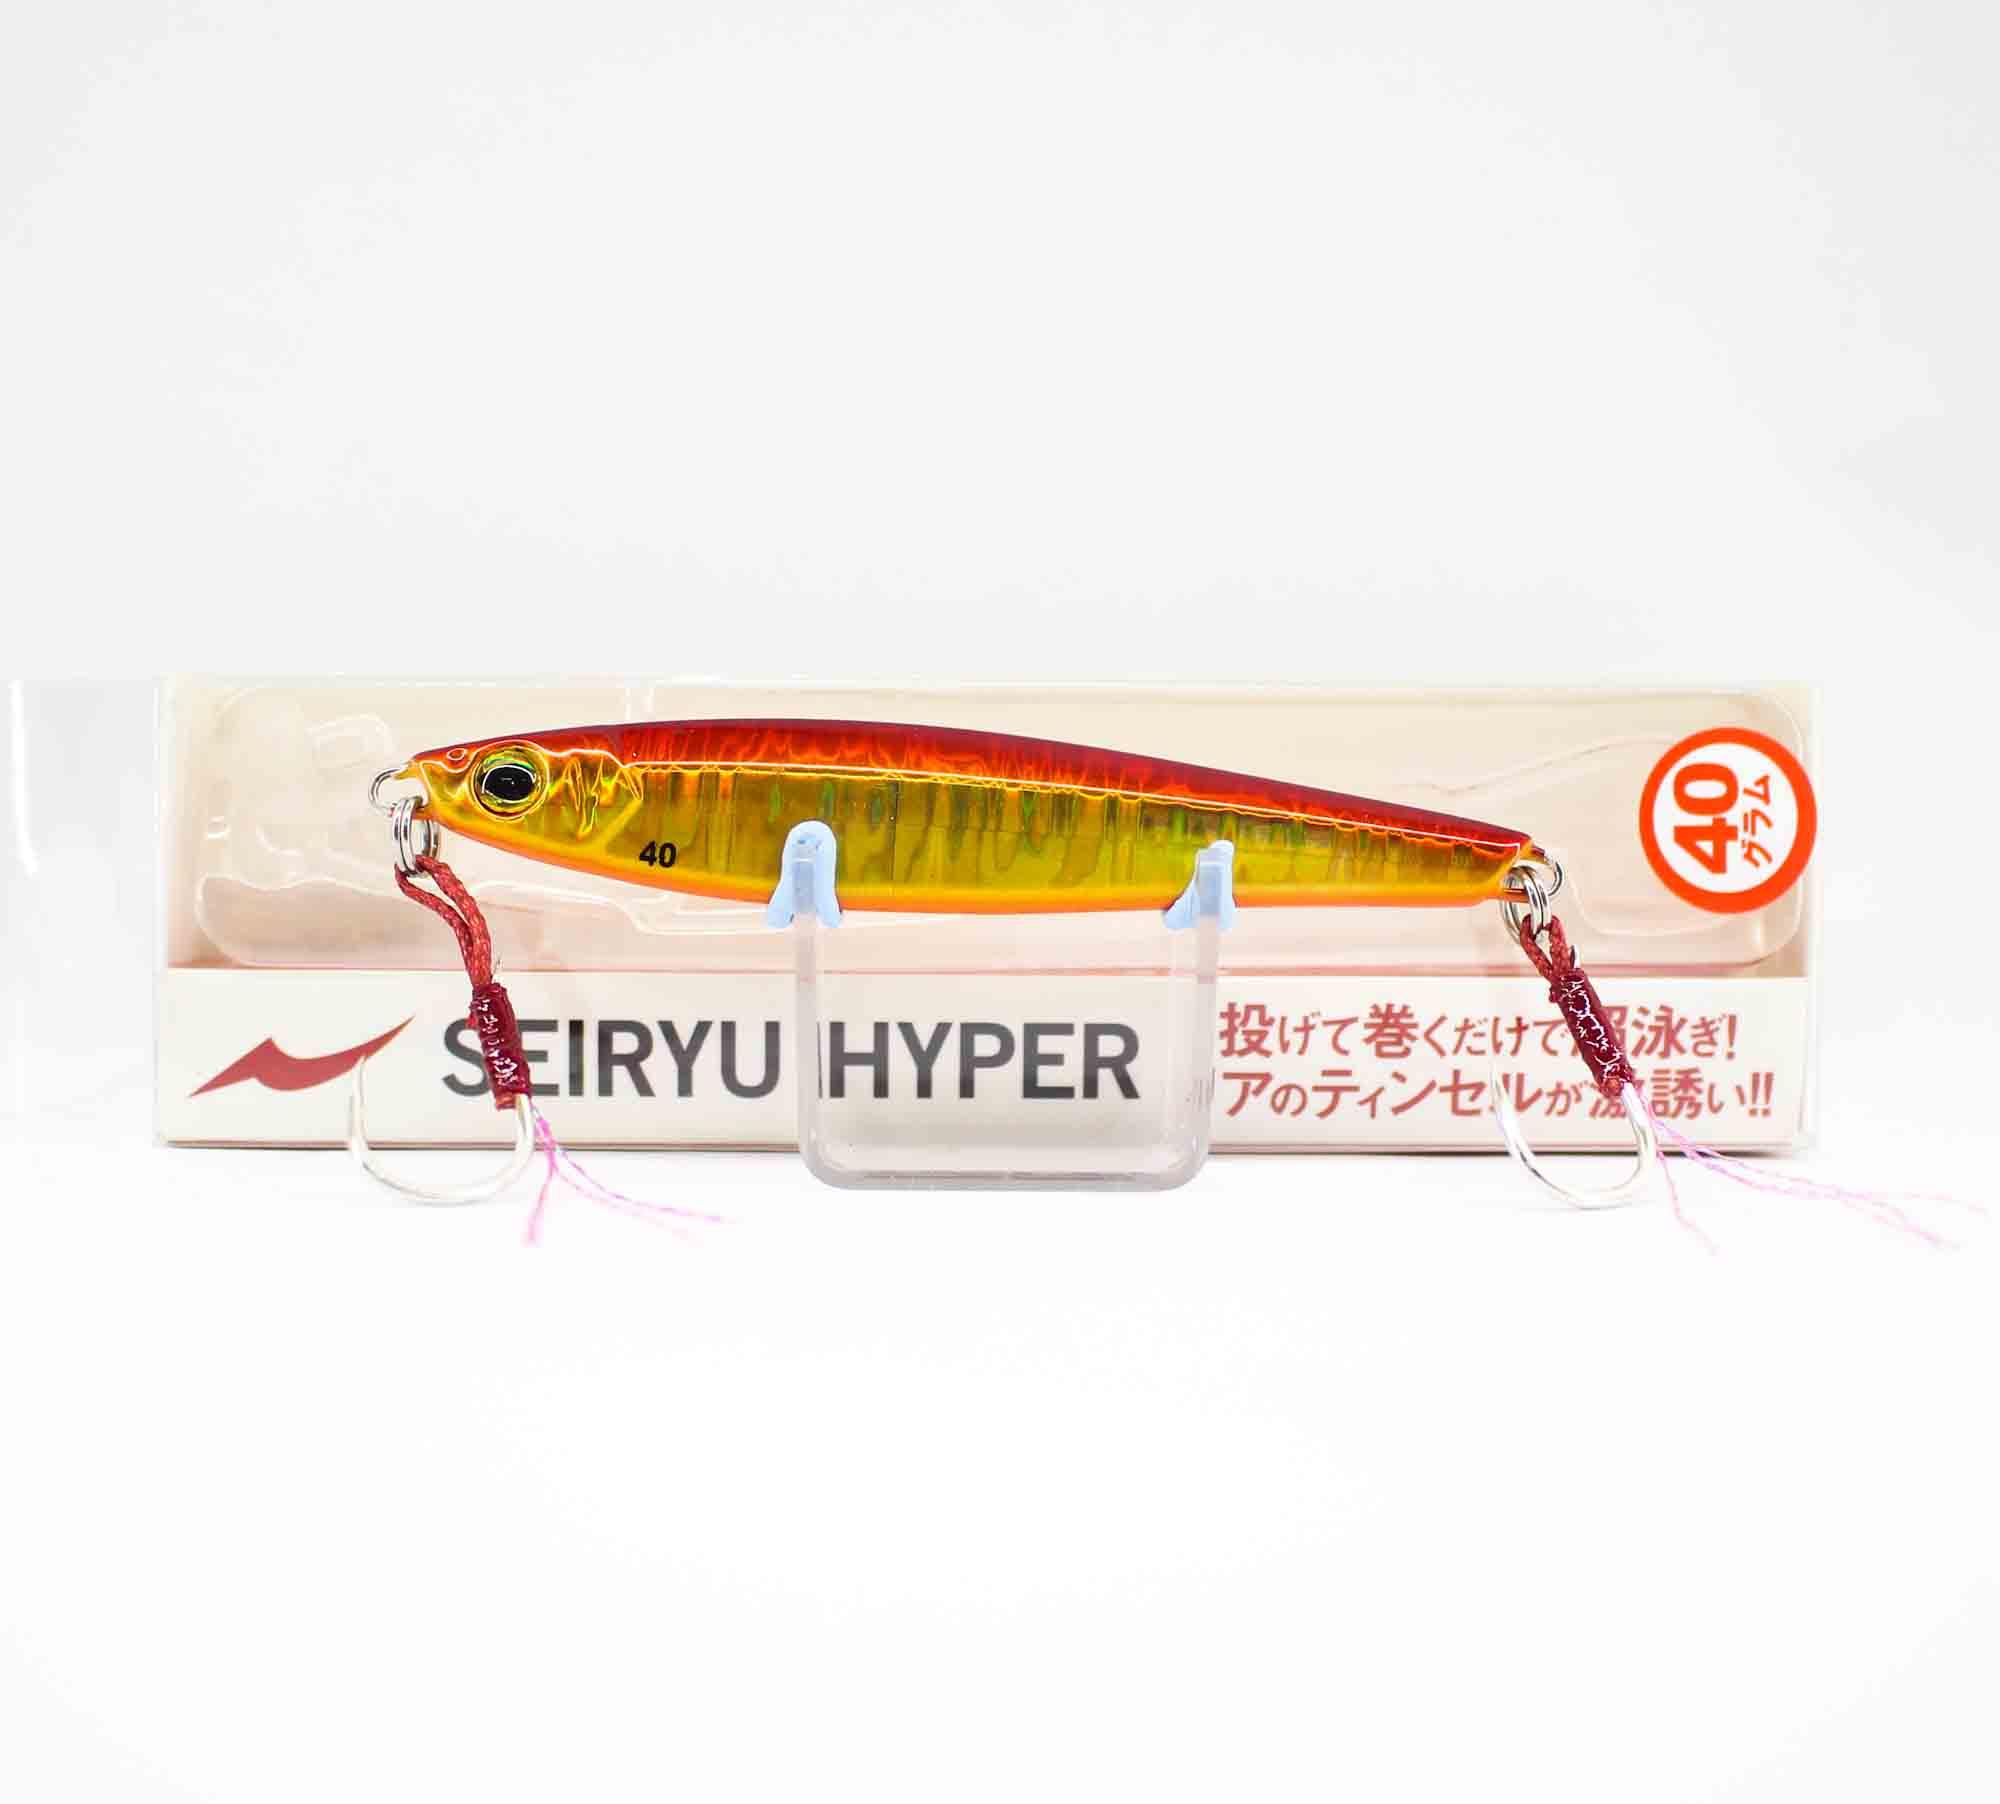 Apia Metal Jig Seiryu Hyper 40 Grams Sinking Lure 05 (2649)